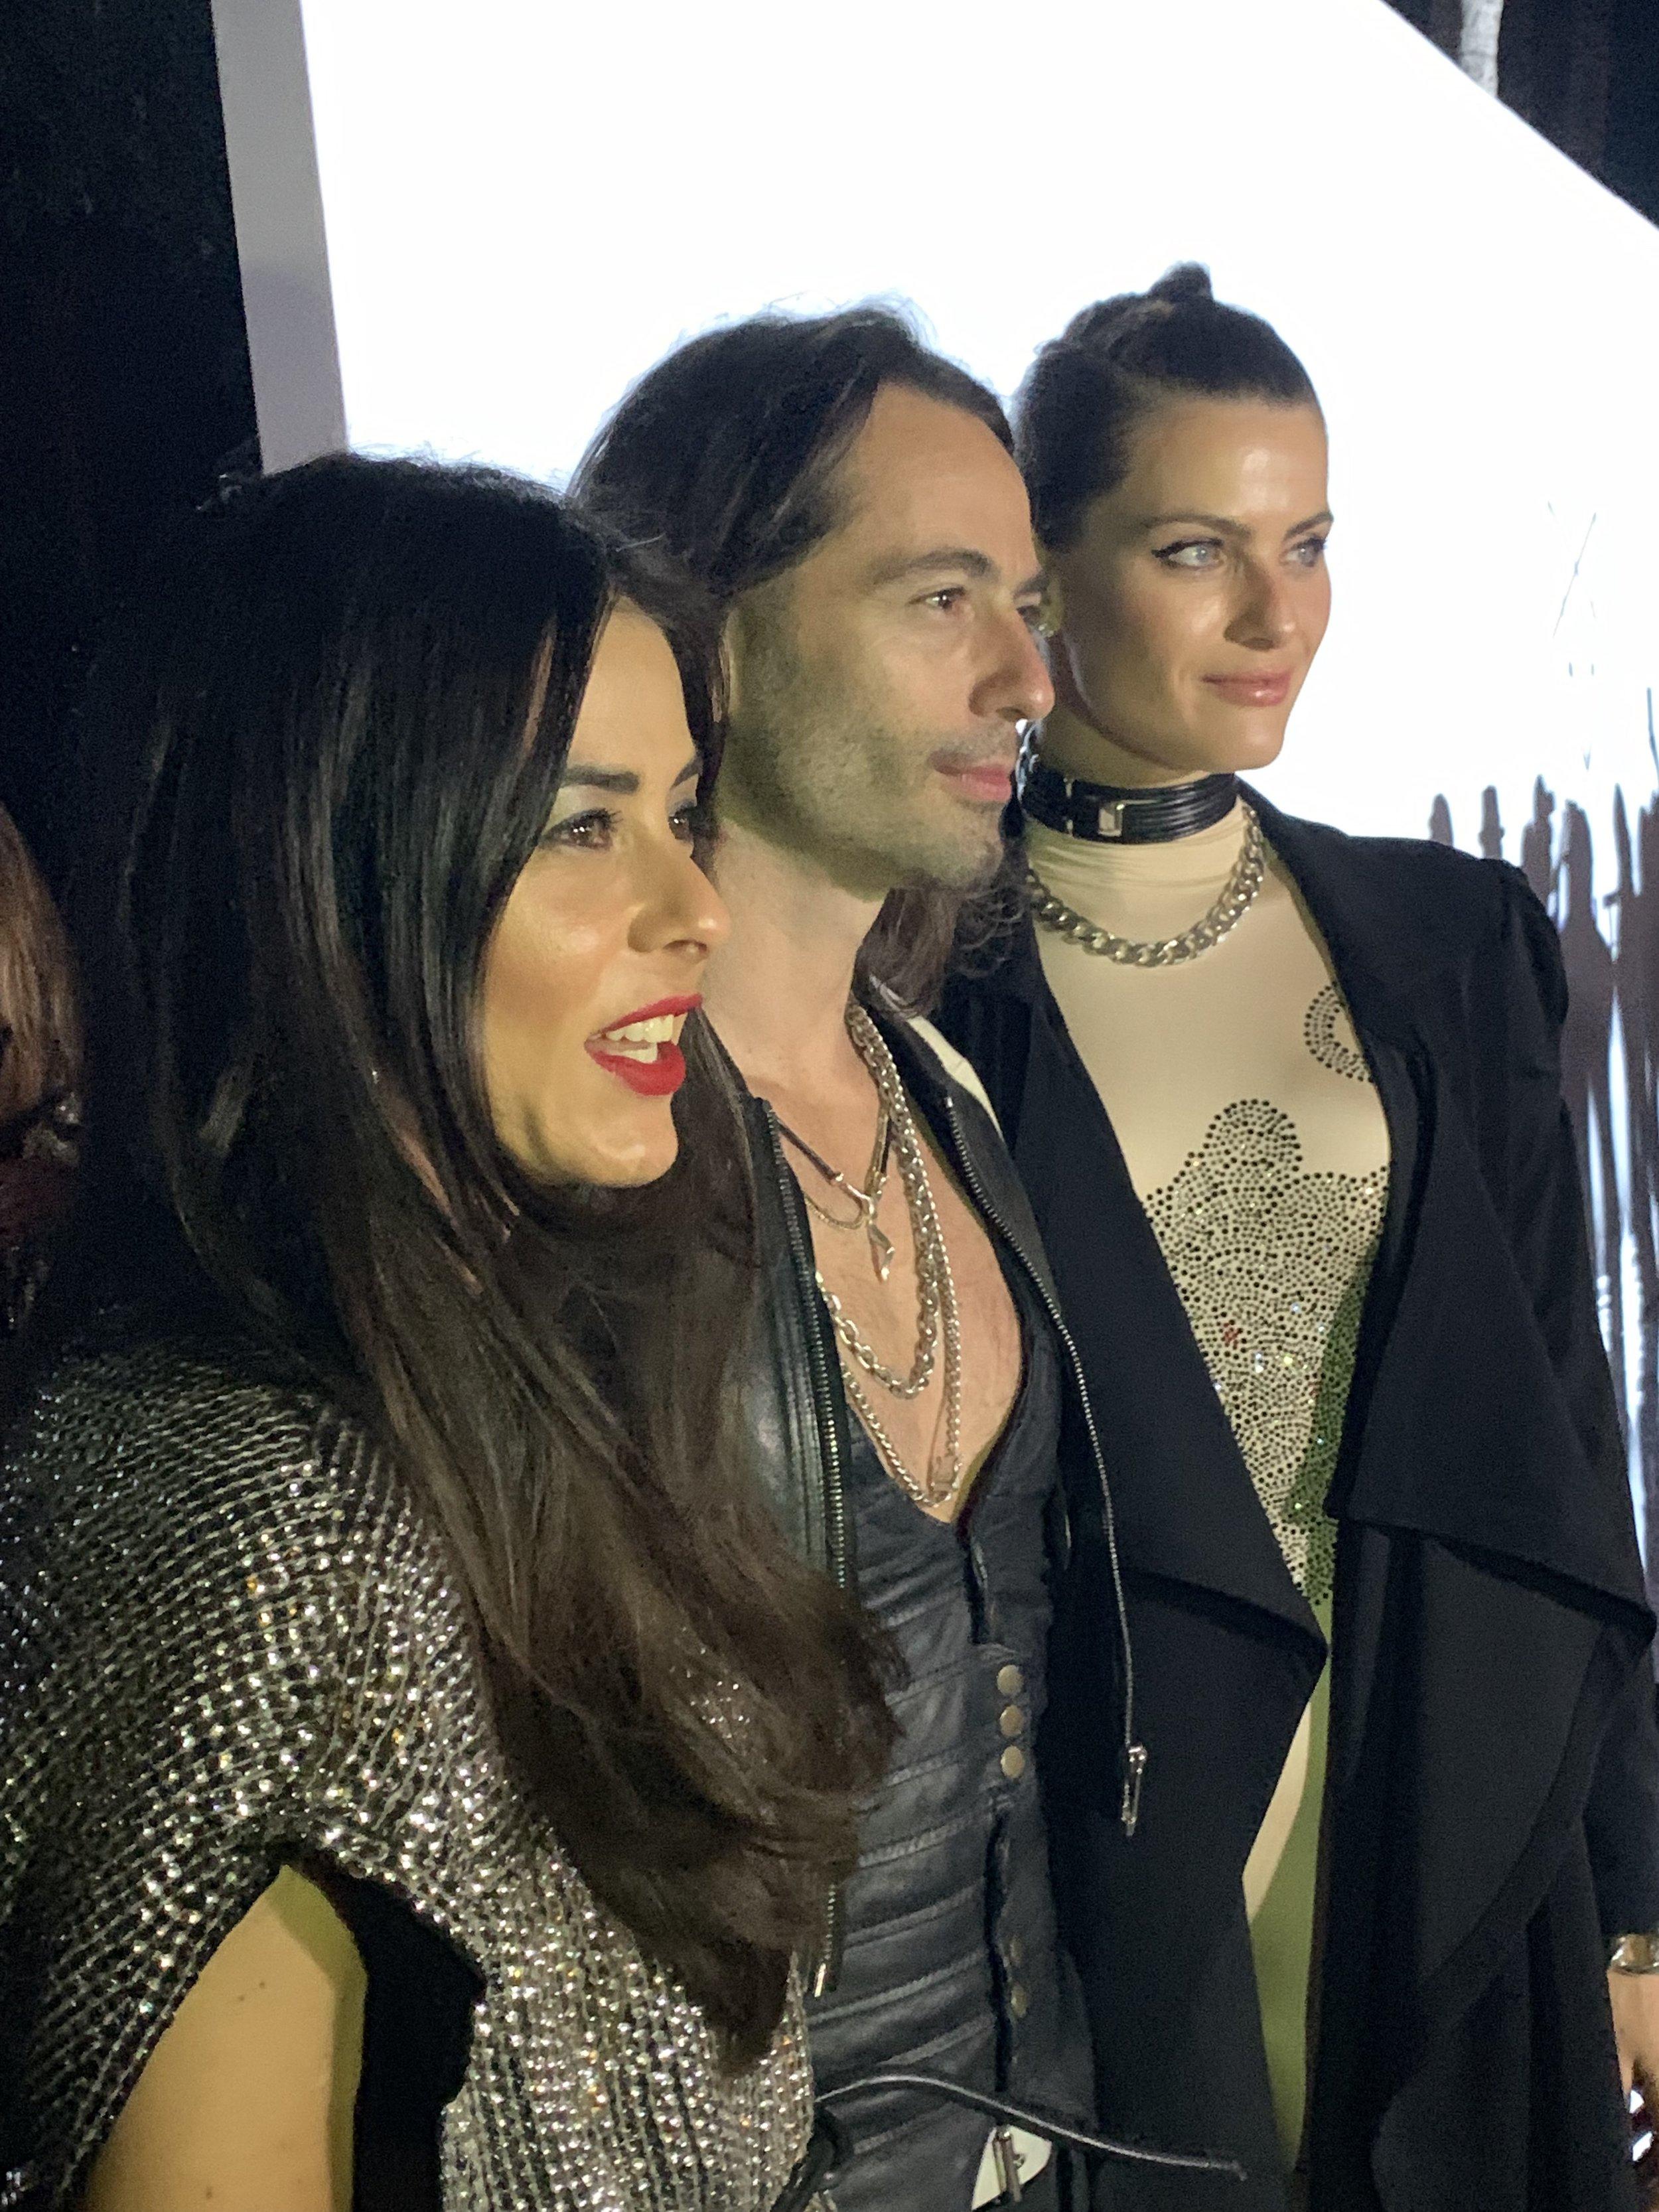 Marco Cavalleria and model Isabeli Fontana